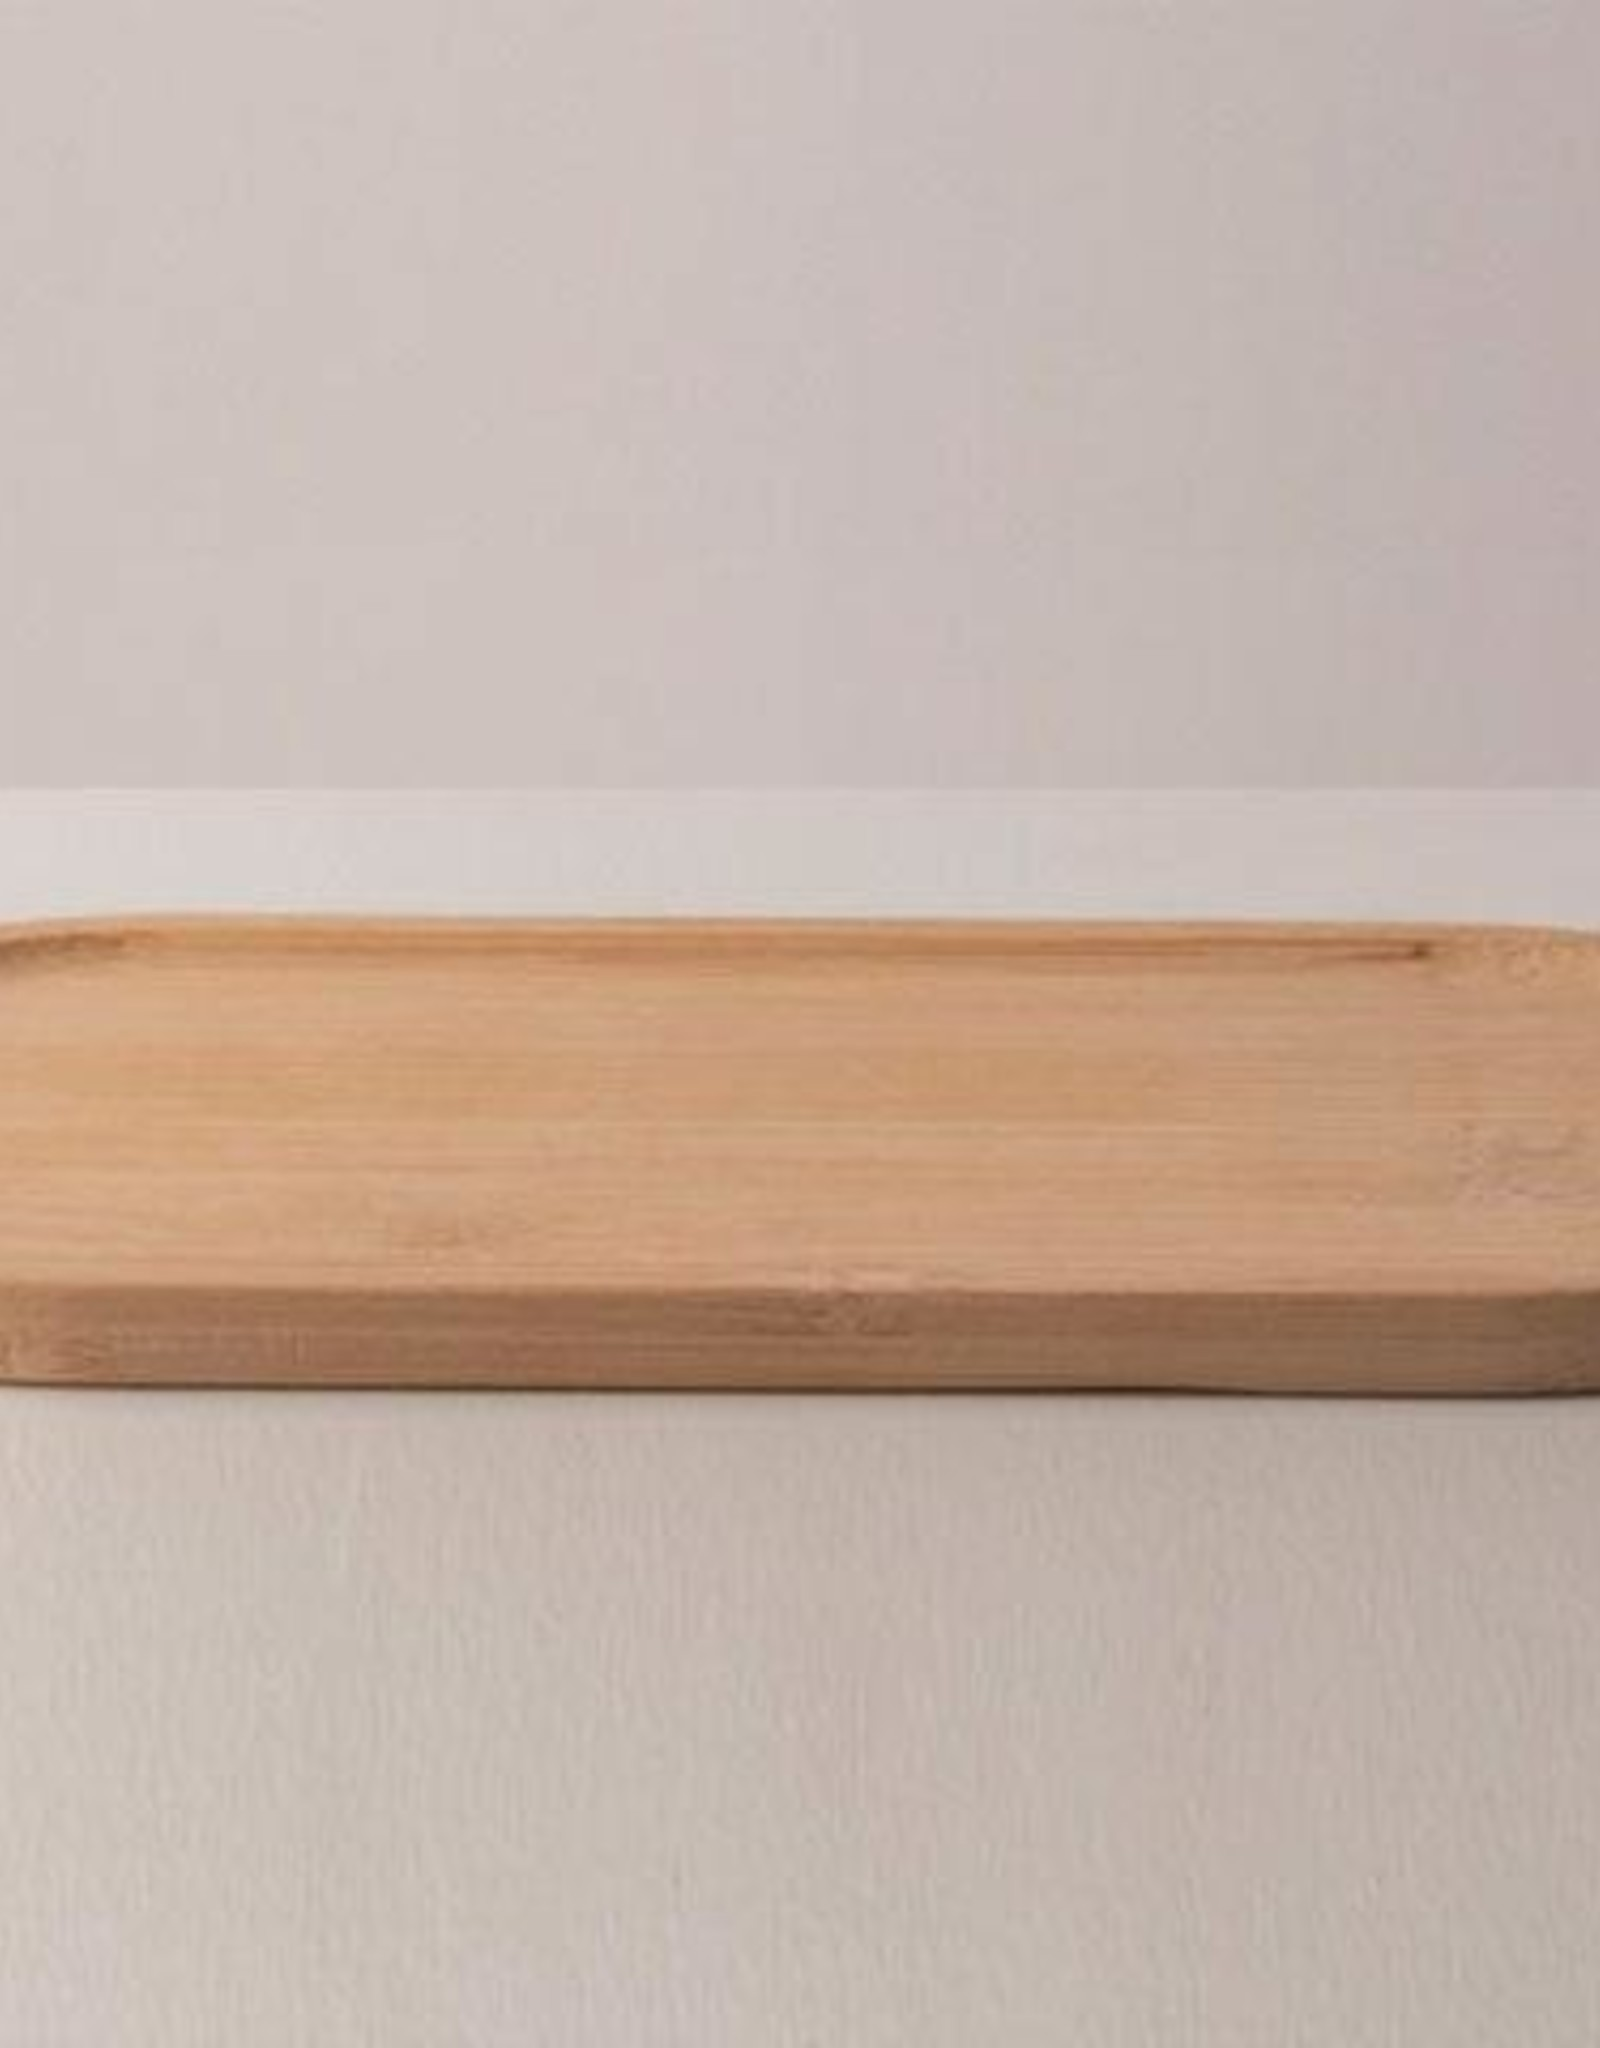 Fika Bamboe Serveerplankje